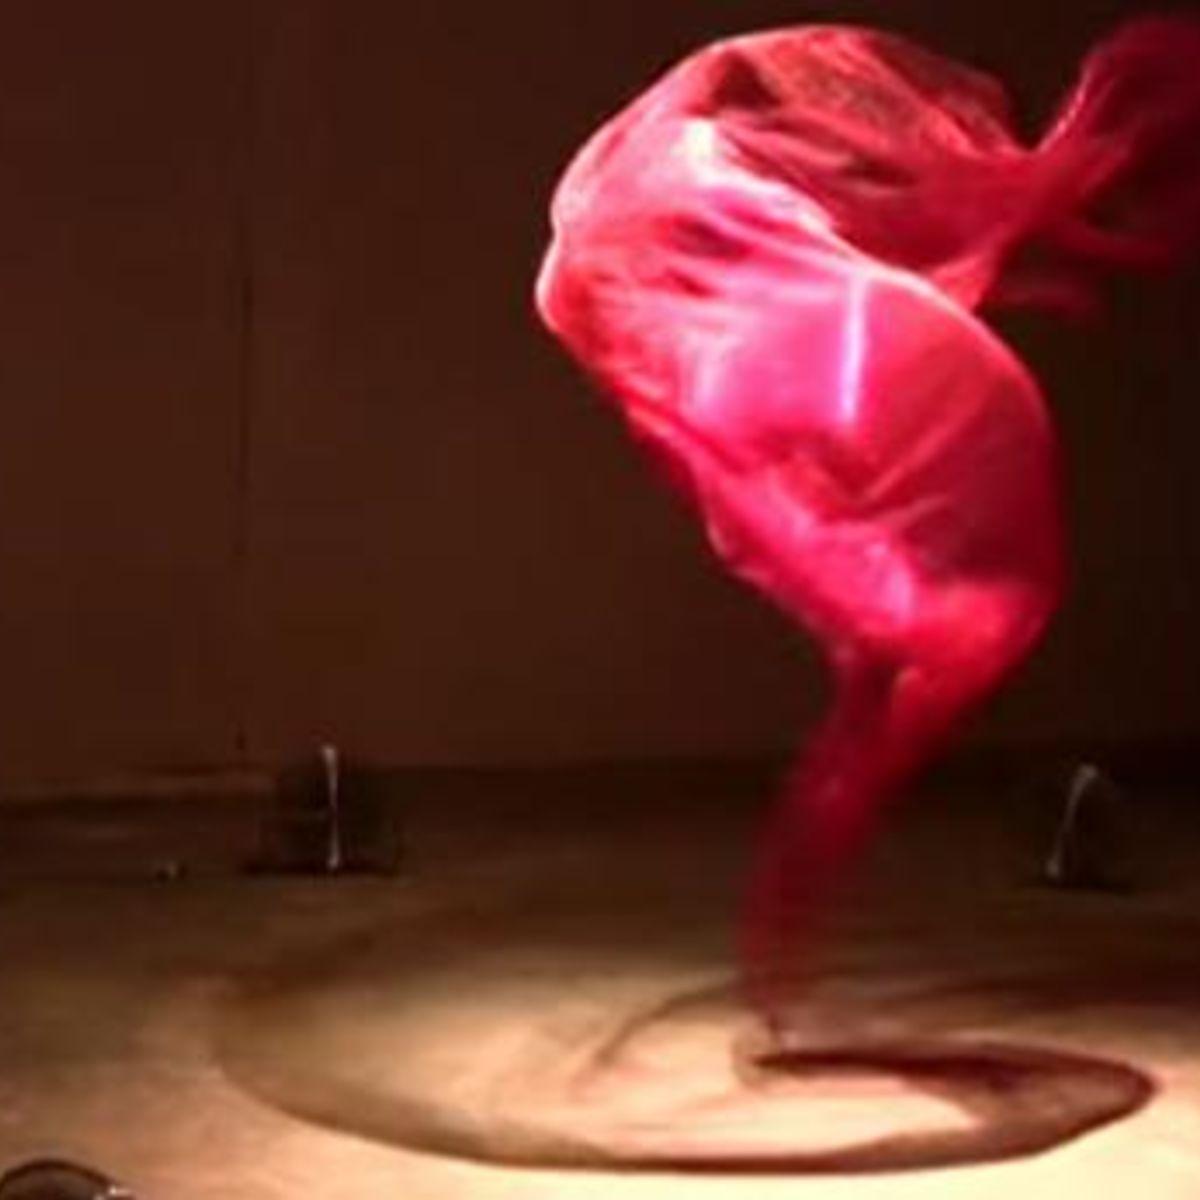 wurtzel_dancingscarf.jpg.CROP.rectangle-large_0.jpg